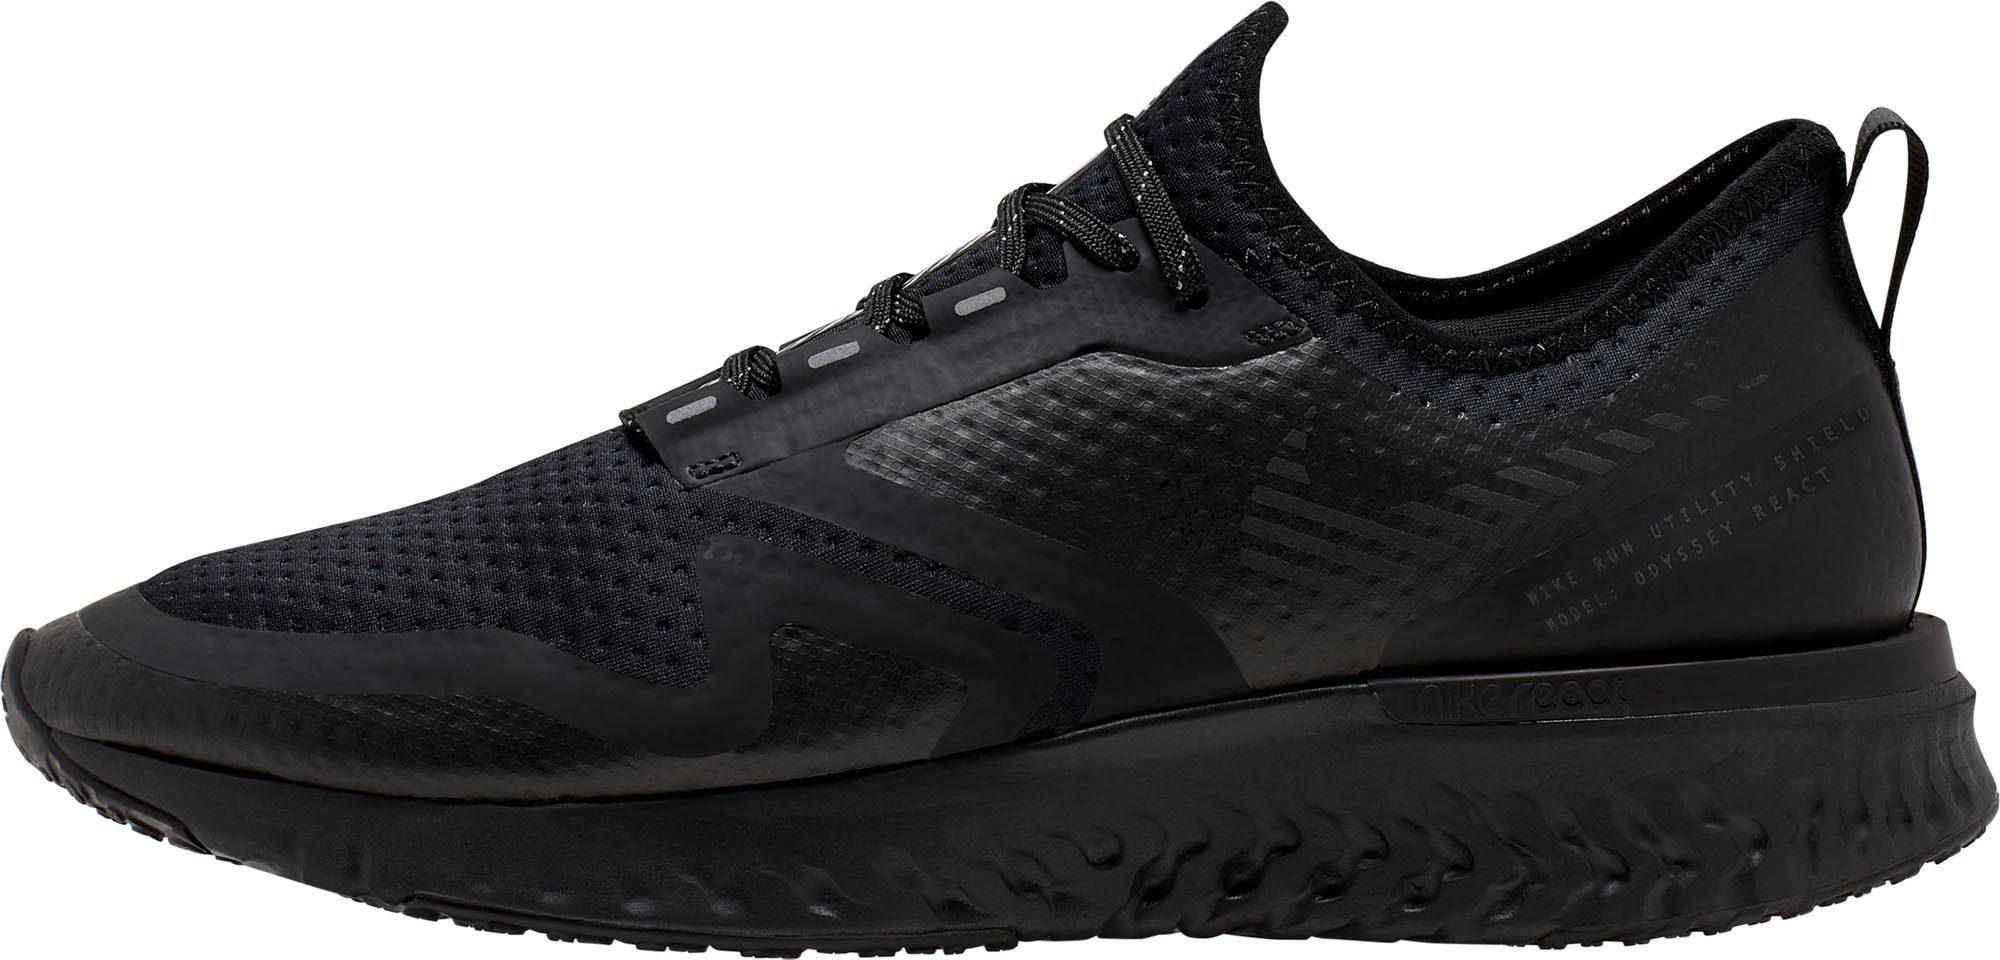 Nike »Wmns Odyssey React Shield 2« Laufschuh | OTTO